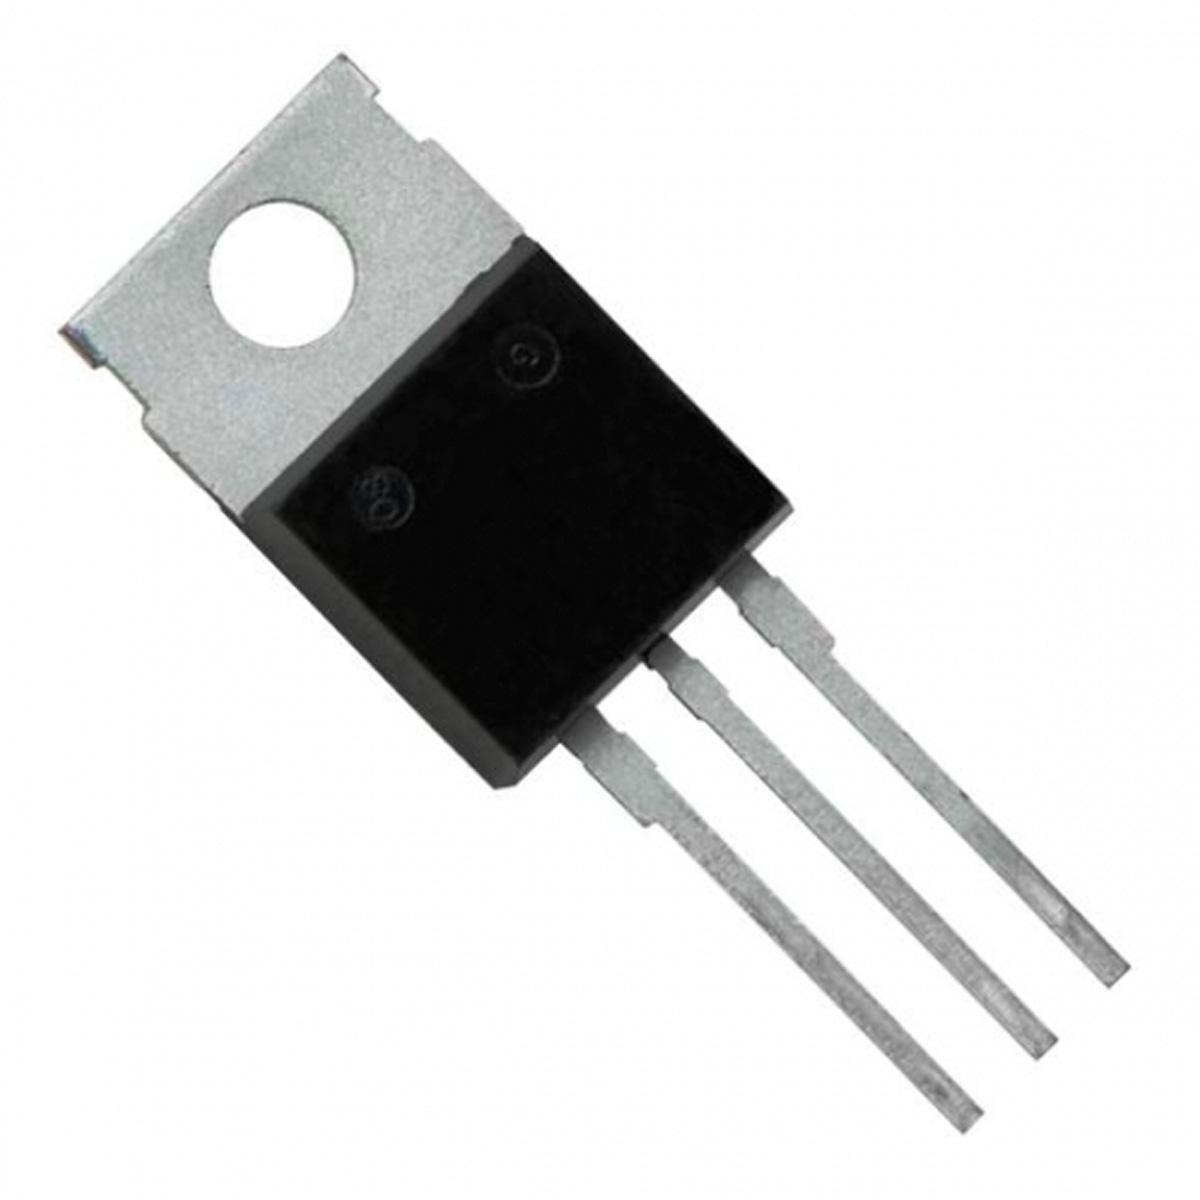 Reguladores de Voltaje 1A TO-220 7805 7806 7808 7809 7812 7820 7824 7905 7915 Cicuitos Integrados CI Electronica Electronico Guatemala ElectronicaSMD